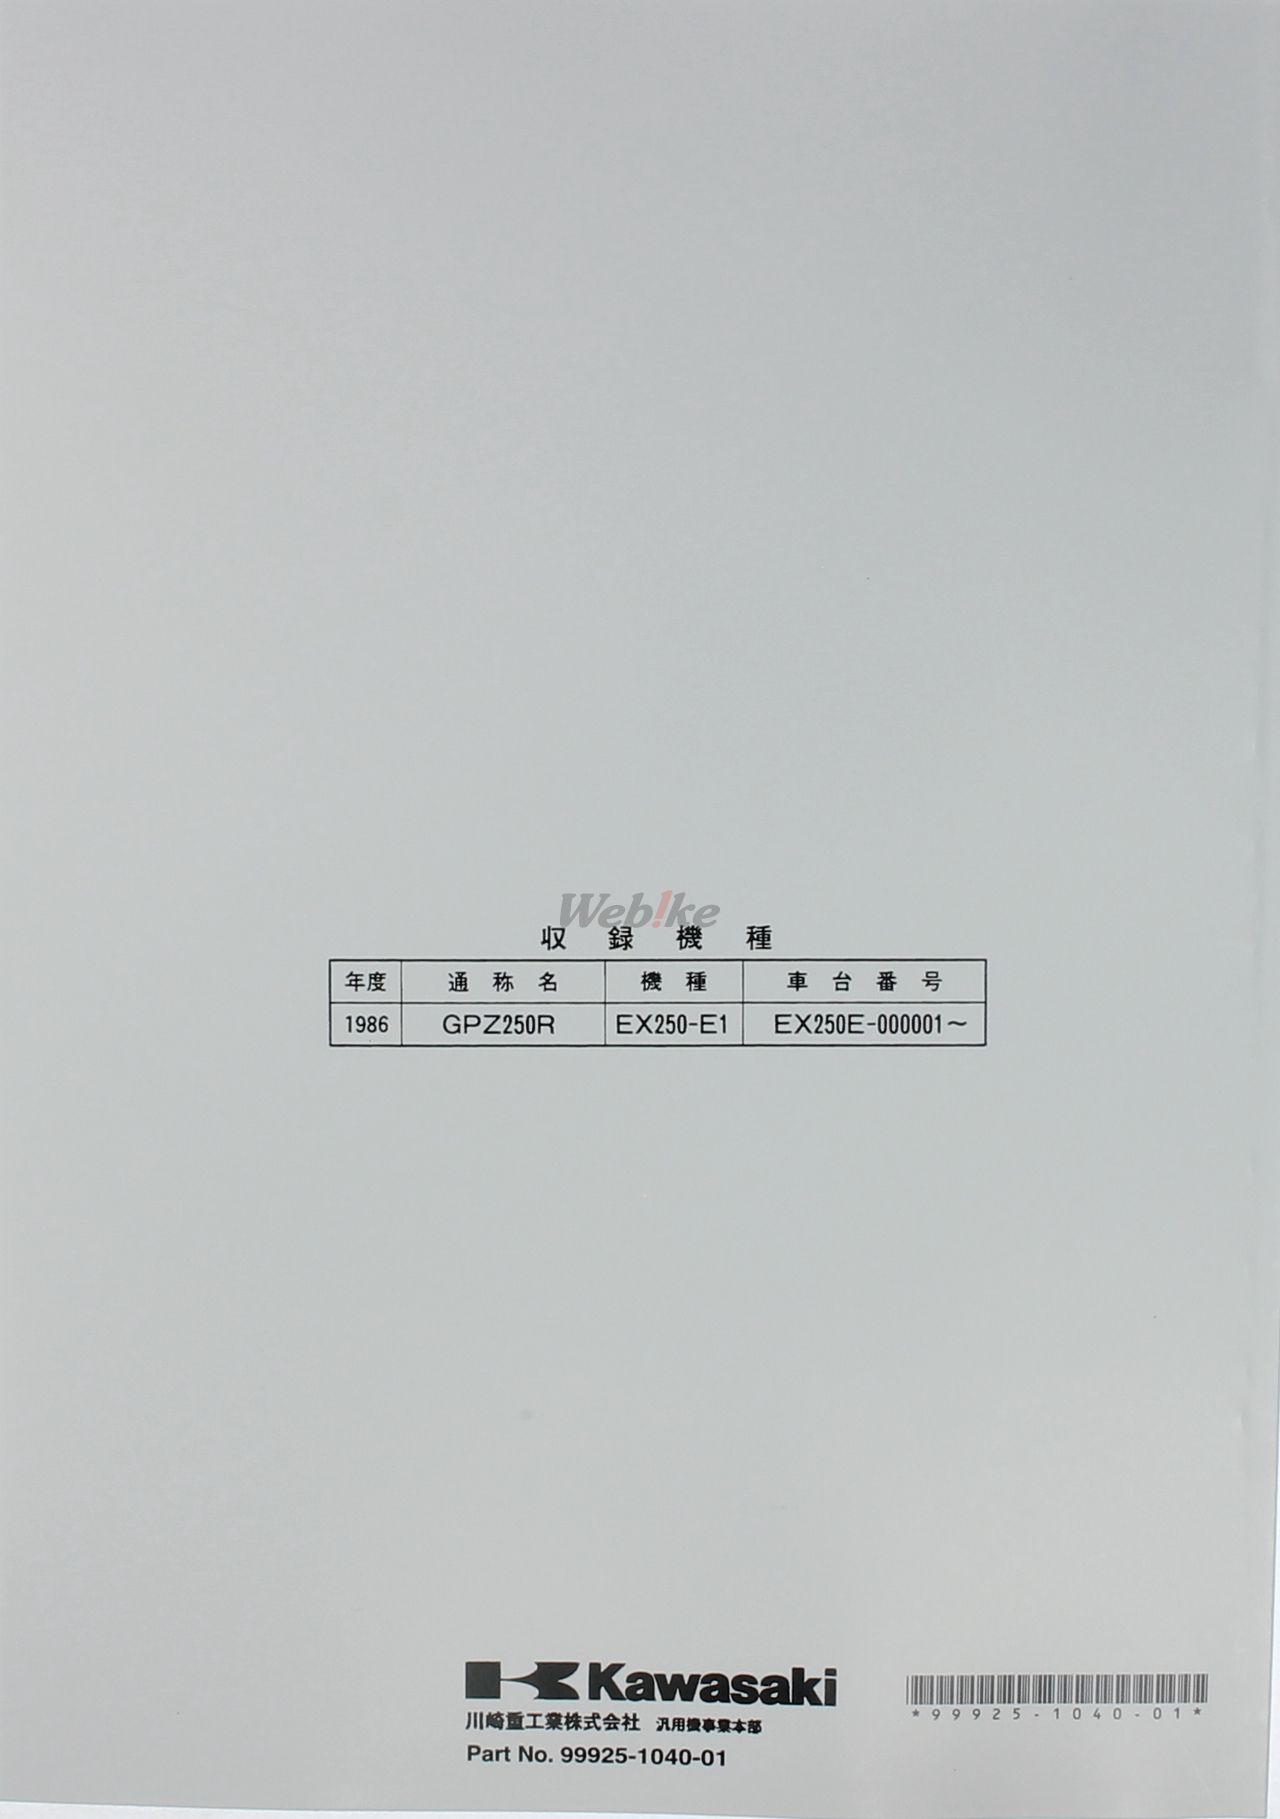 【KAWASAKI】EX250/GPX250/ZZR250/ELIMINATOR250 維修手冊(基本版) - 「Webike-摩托百貨」